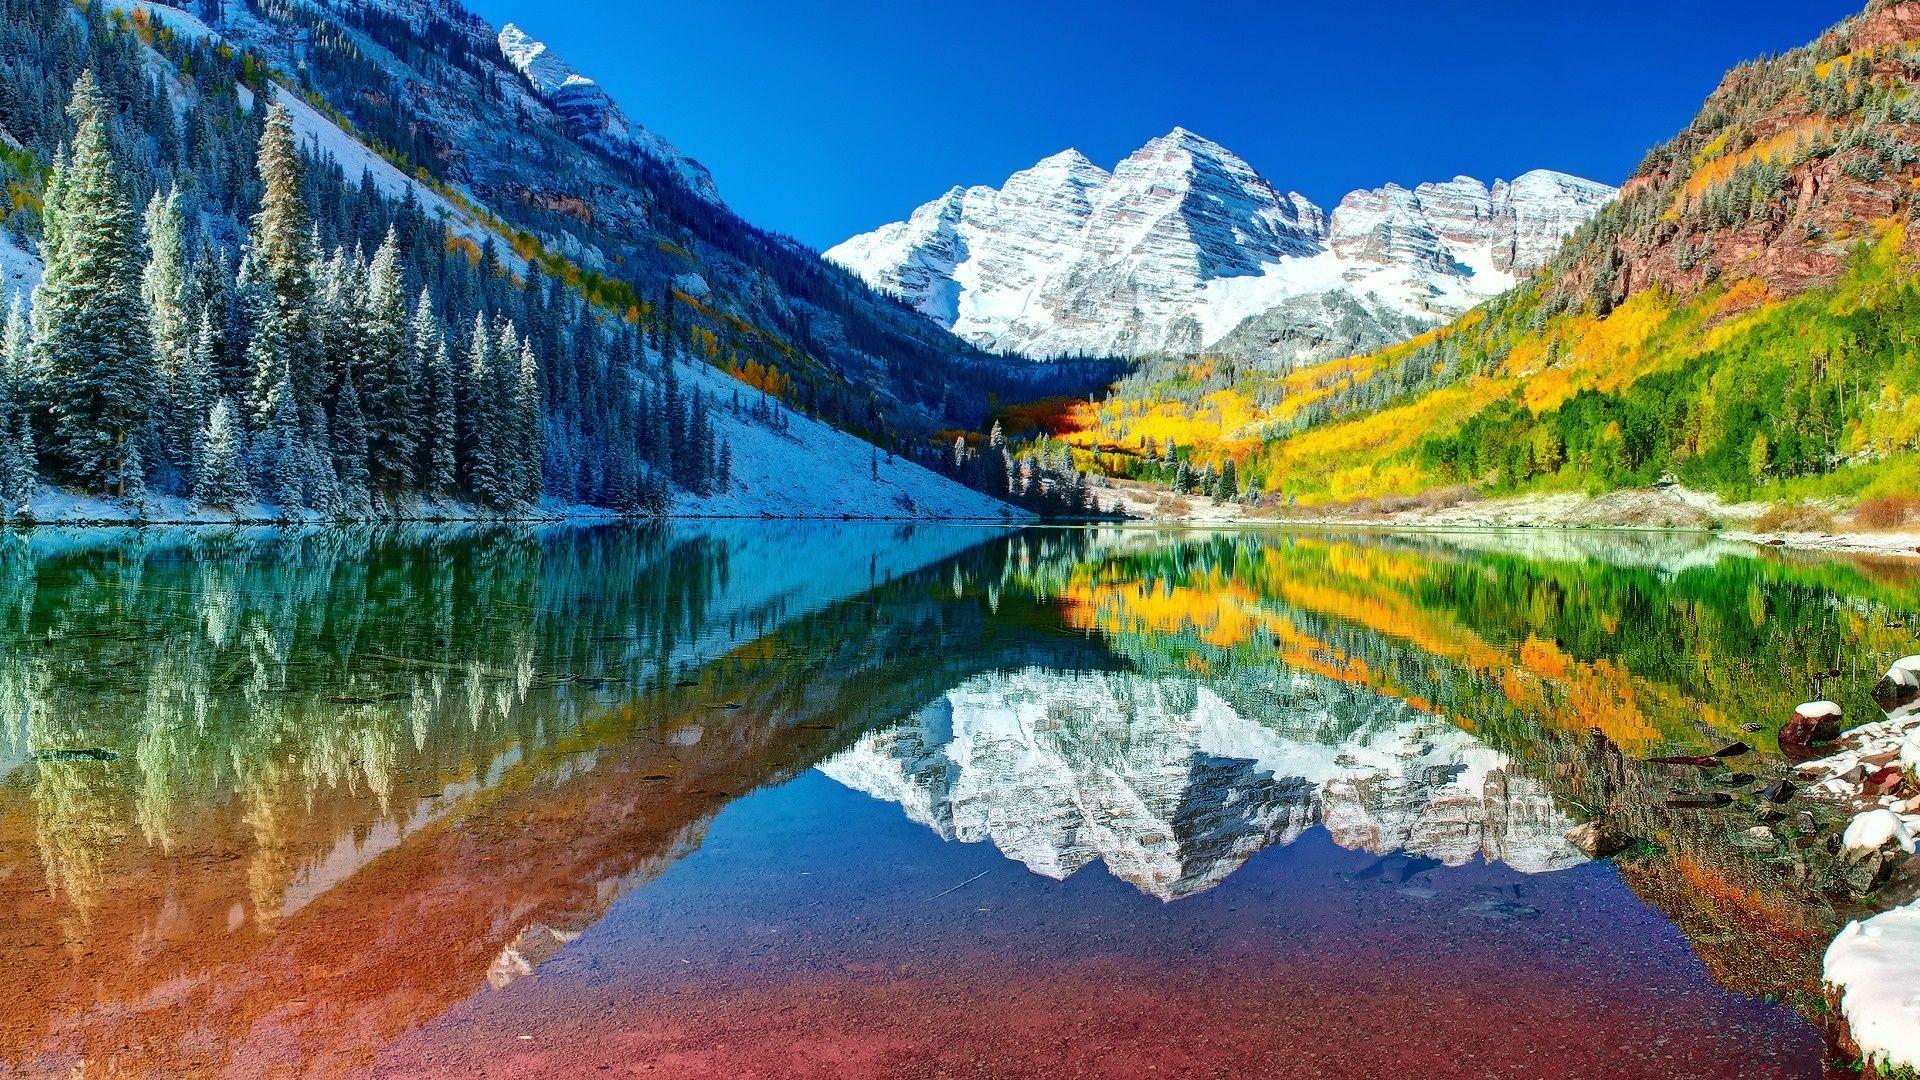 Good Wallpaper High Resolution Colorado - 545e072b2bd4758a6f2ff88bfa8a7699  Image_218299.jpg